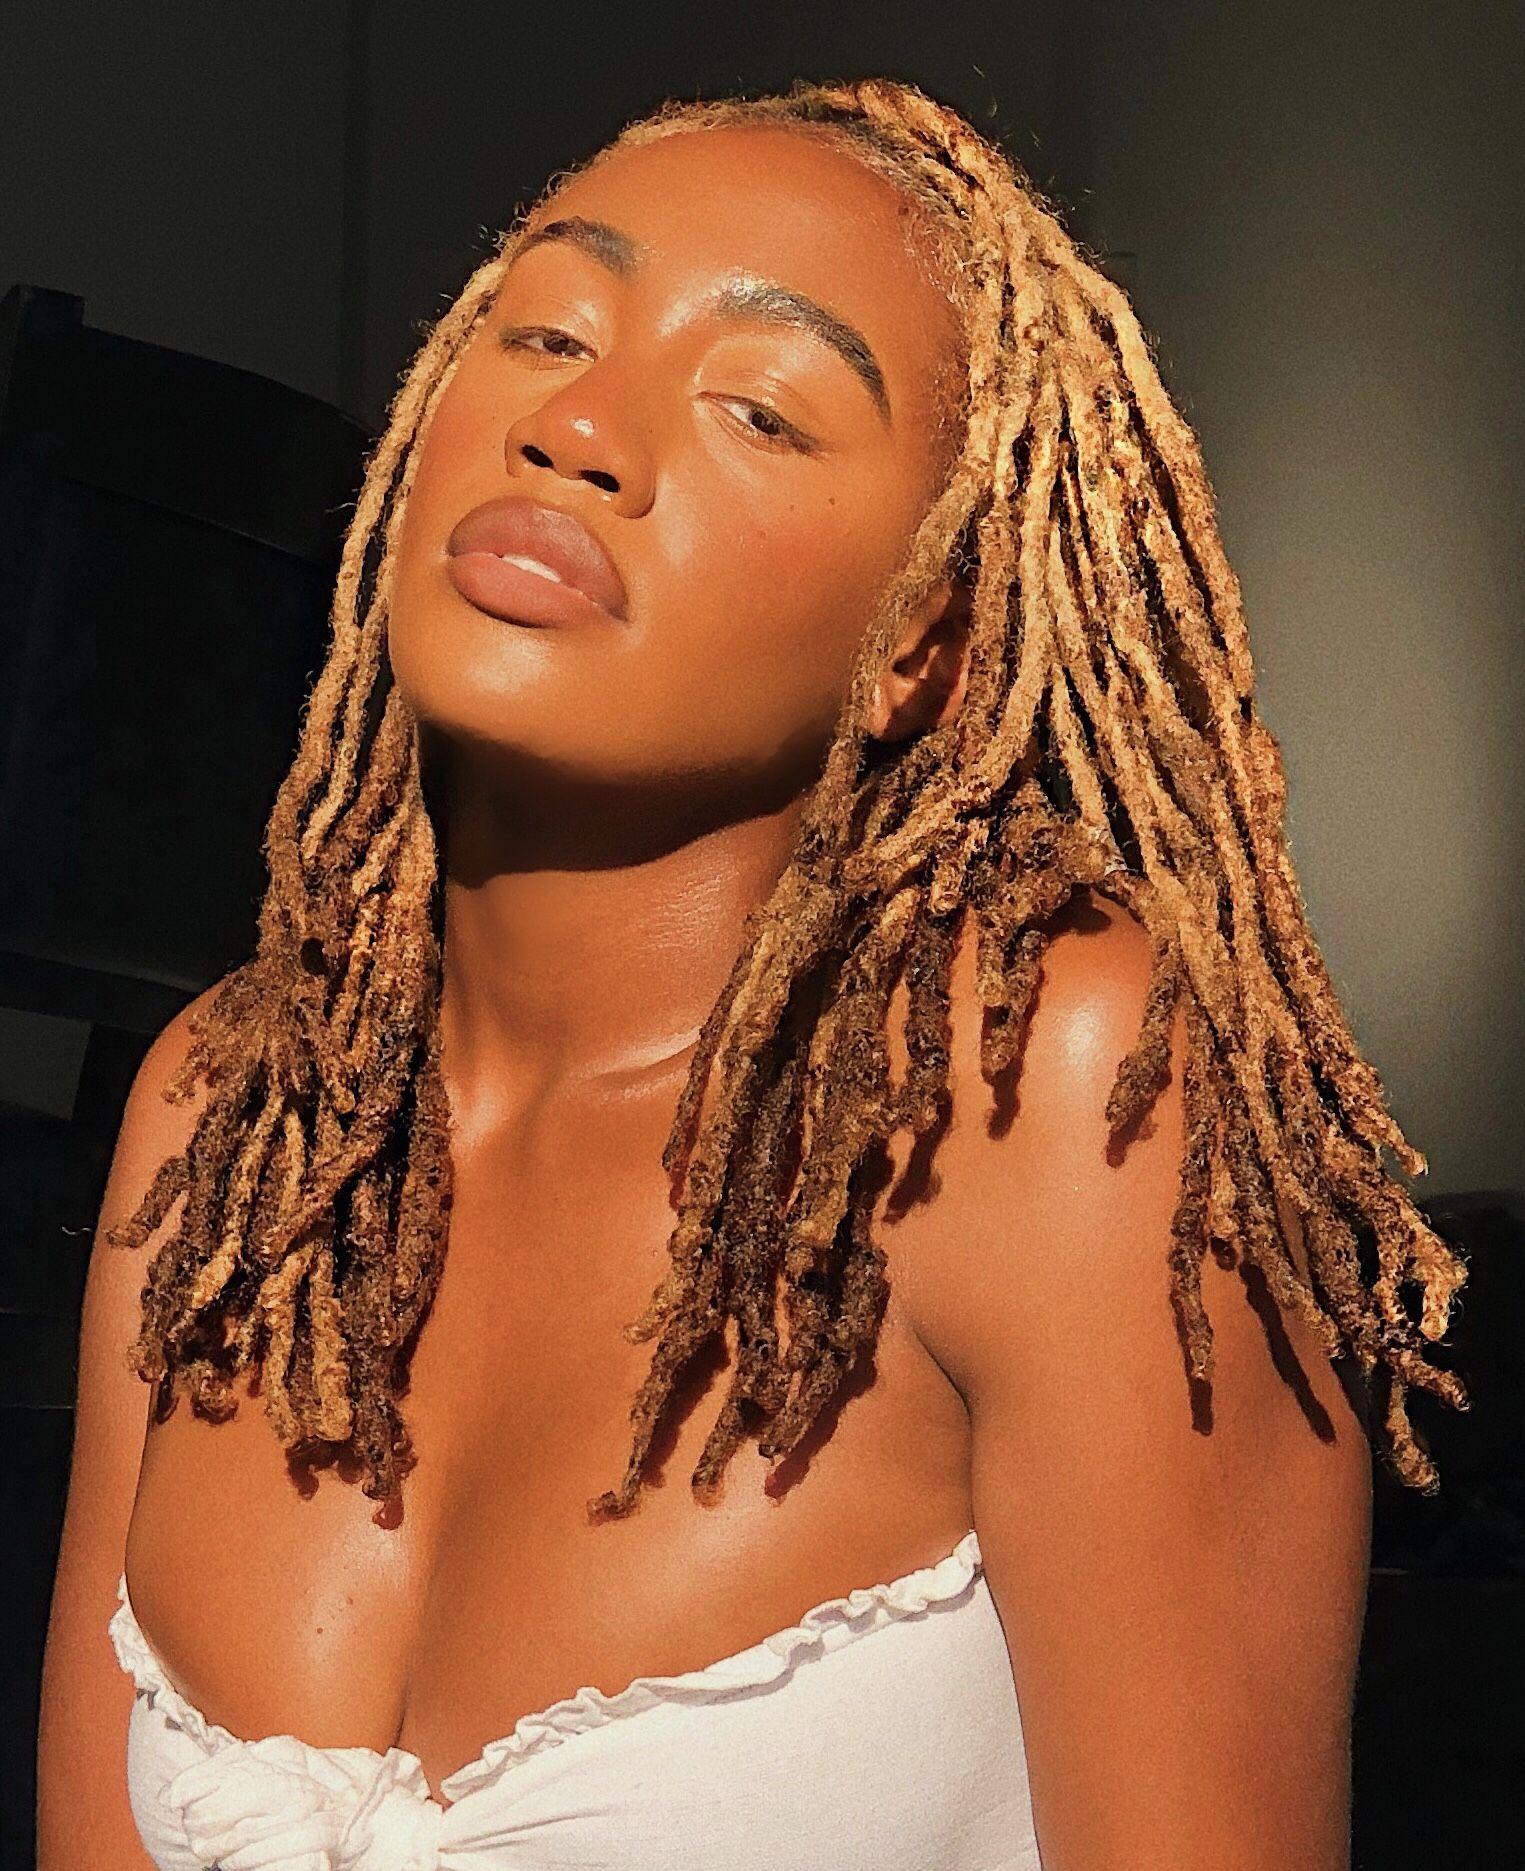 #locstyles #natural #naturalhair #locs #womenwithlocs #3chair #4ahair #4bhair #naturalhair #dreadstyles #dreadstagram #locshairstylesforwomen #blackwomensmakeup #blackwomensfashion